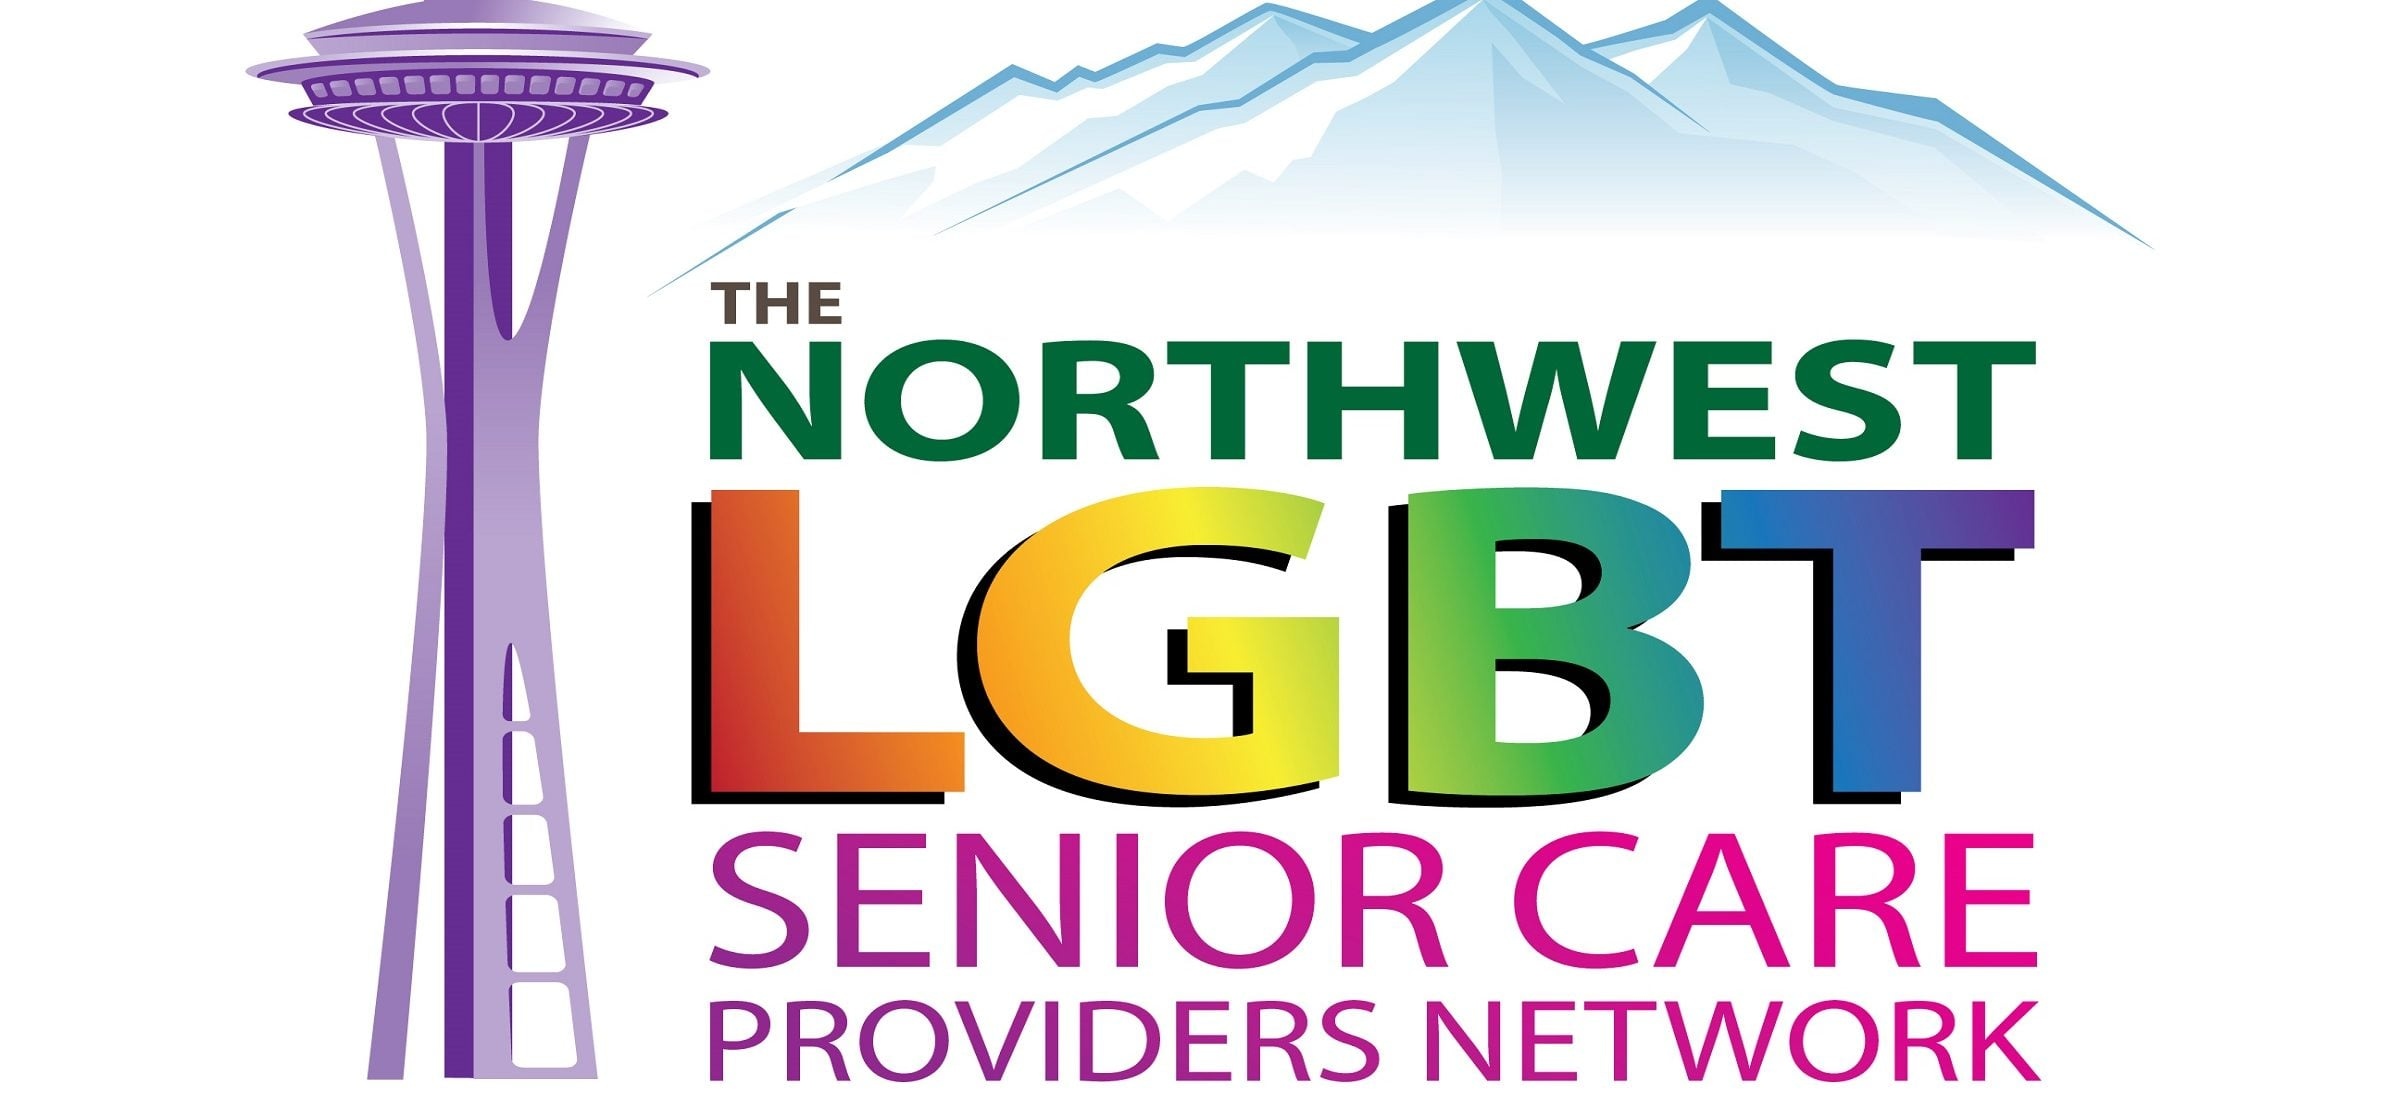 NorthWest LGBT Senior Care Providers Network